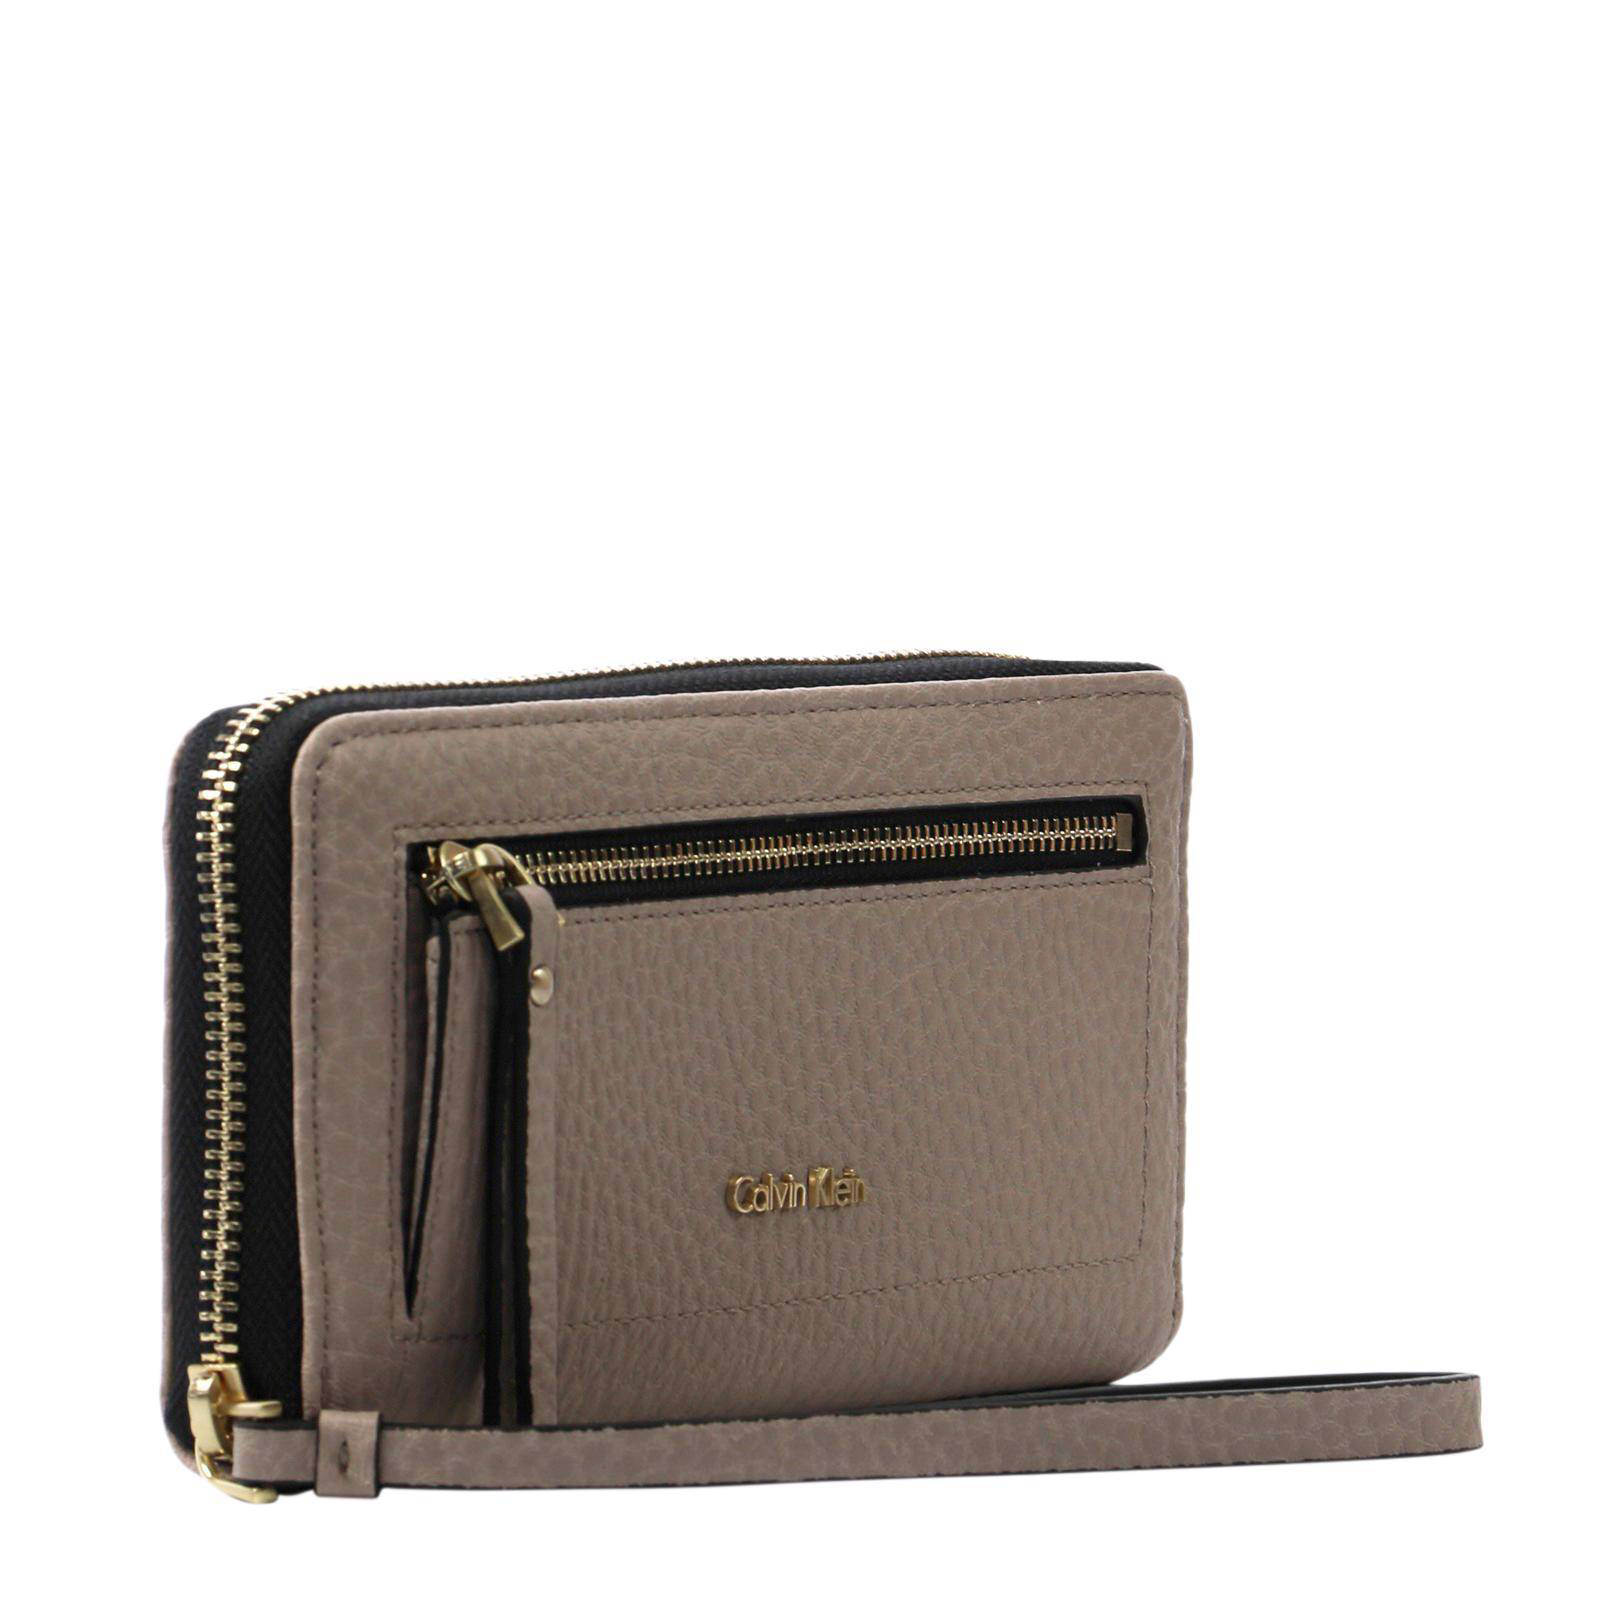 b46723d04cf Calvin Klein portemonnee | wehkamp